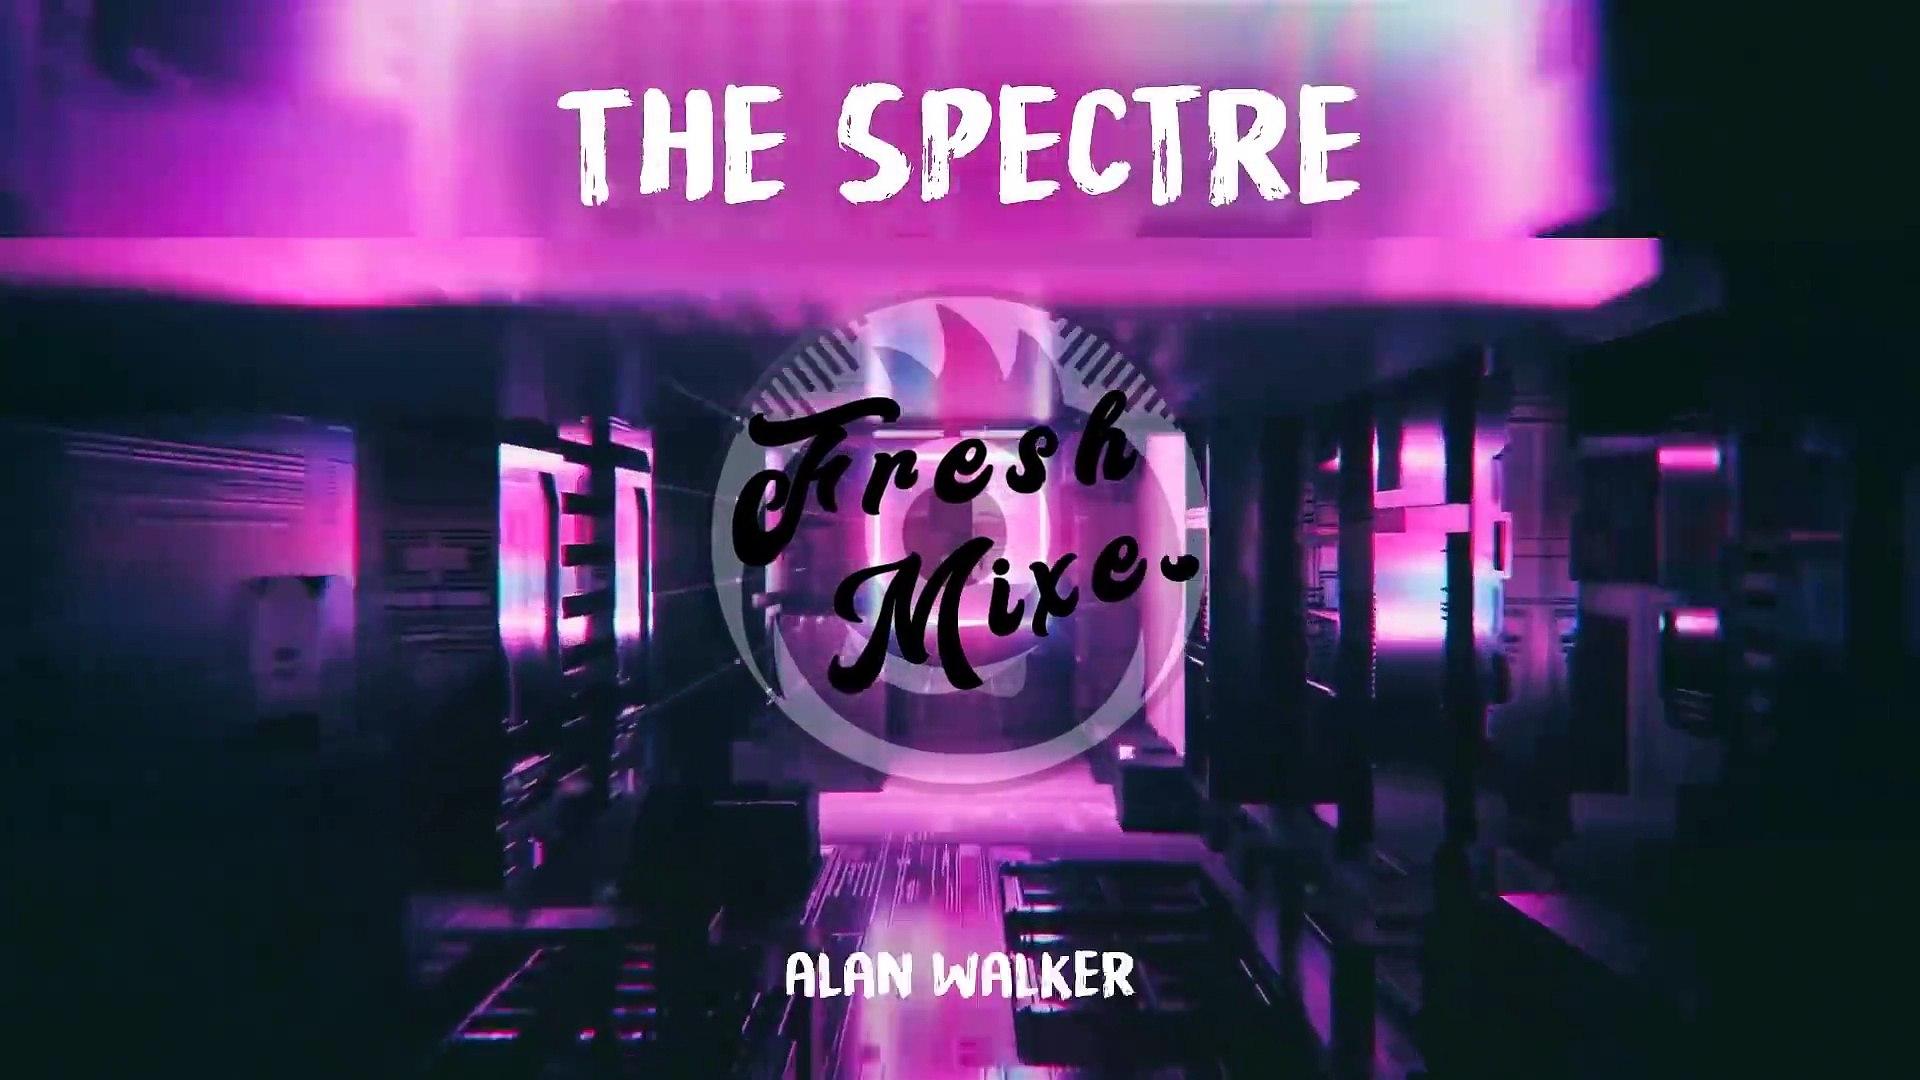 The Spectre Alan Walker The Spectre Alan Walker 2020 05 19